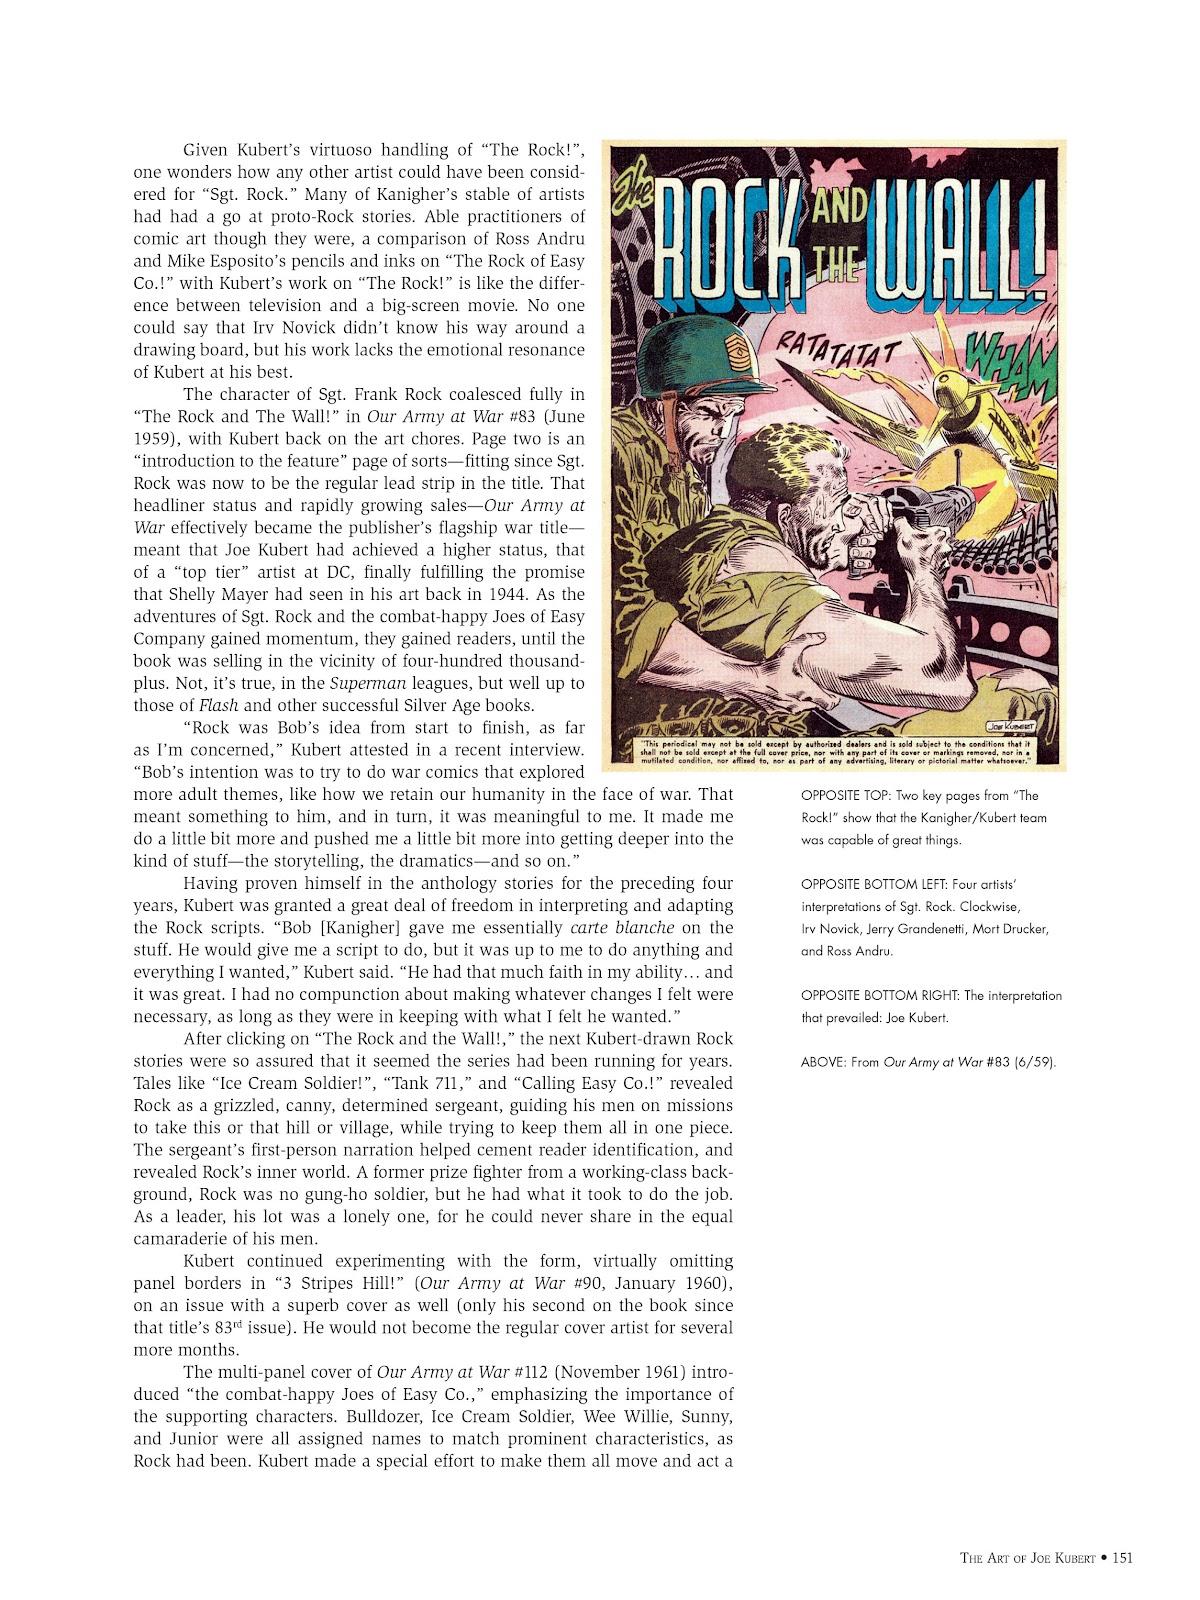 Read online The Art of Joe Kubert comic -  Issue # TPB (Part 2) - 51